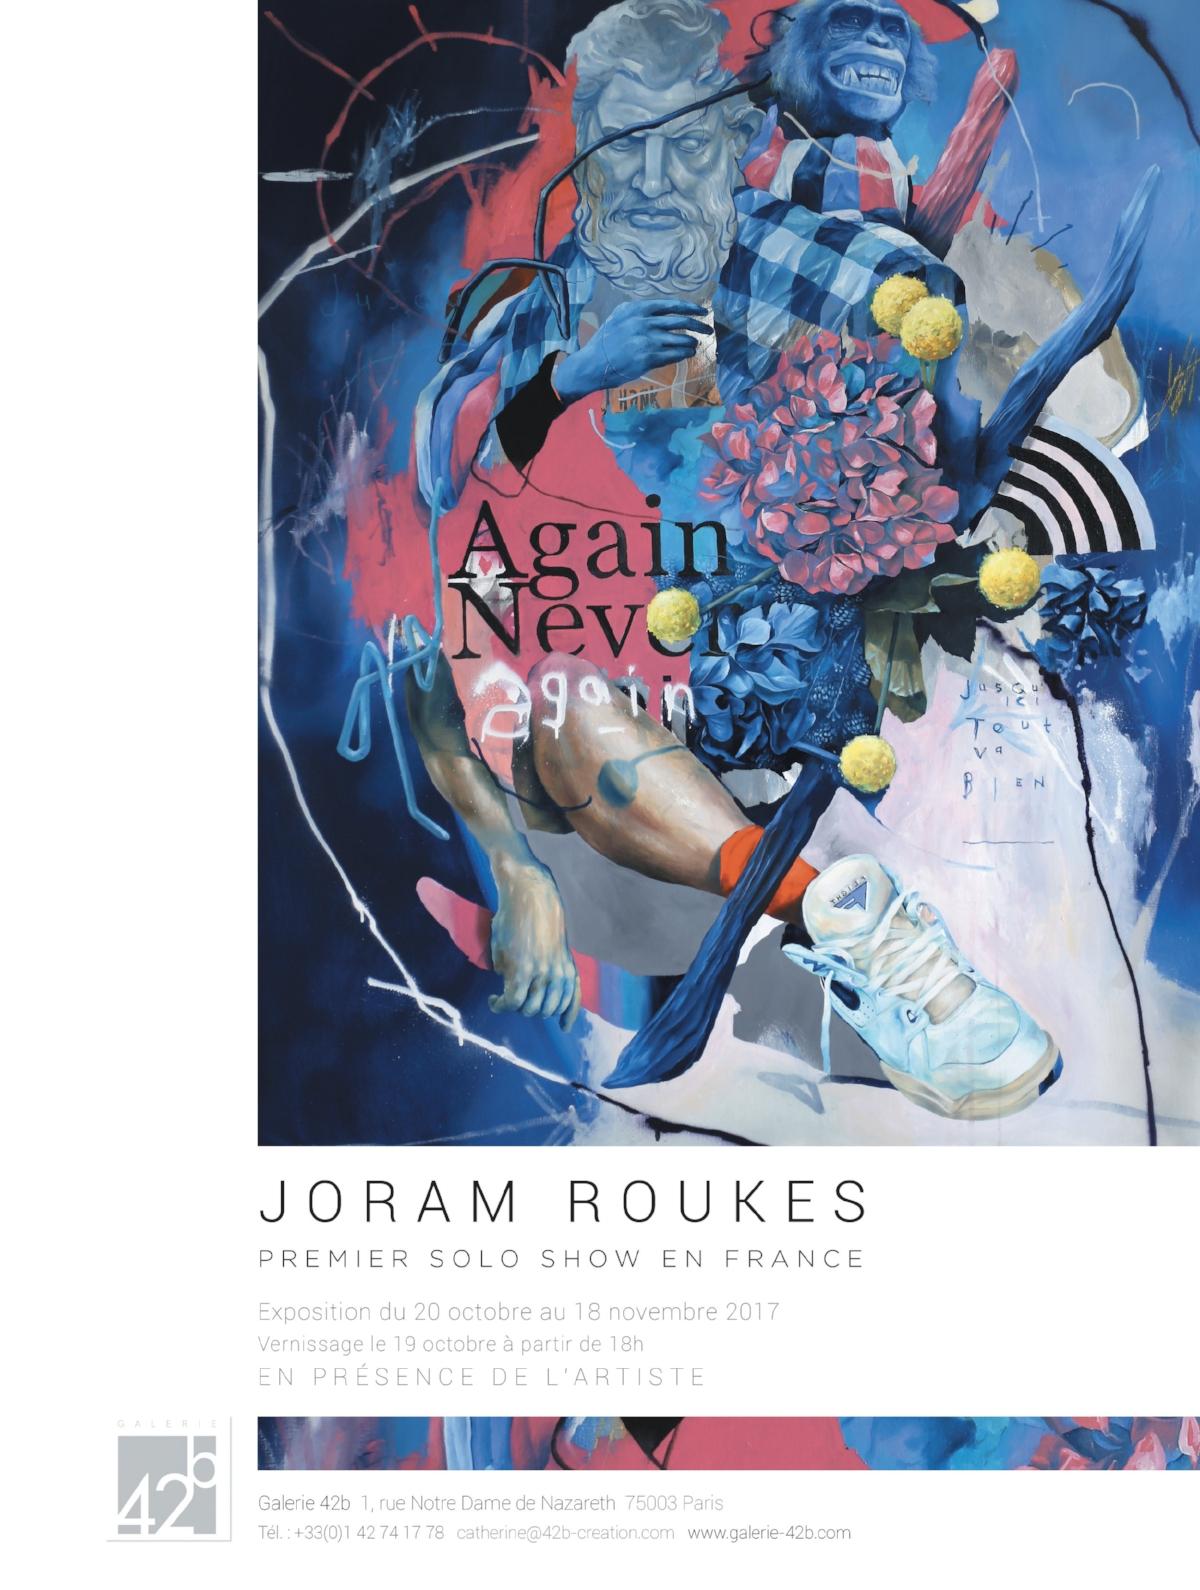 Invitation JORAM ROUKES - AGAIN NEVER AGAIN